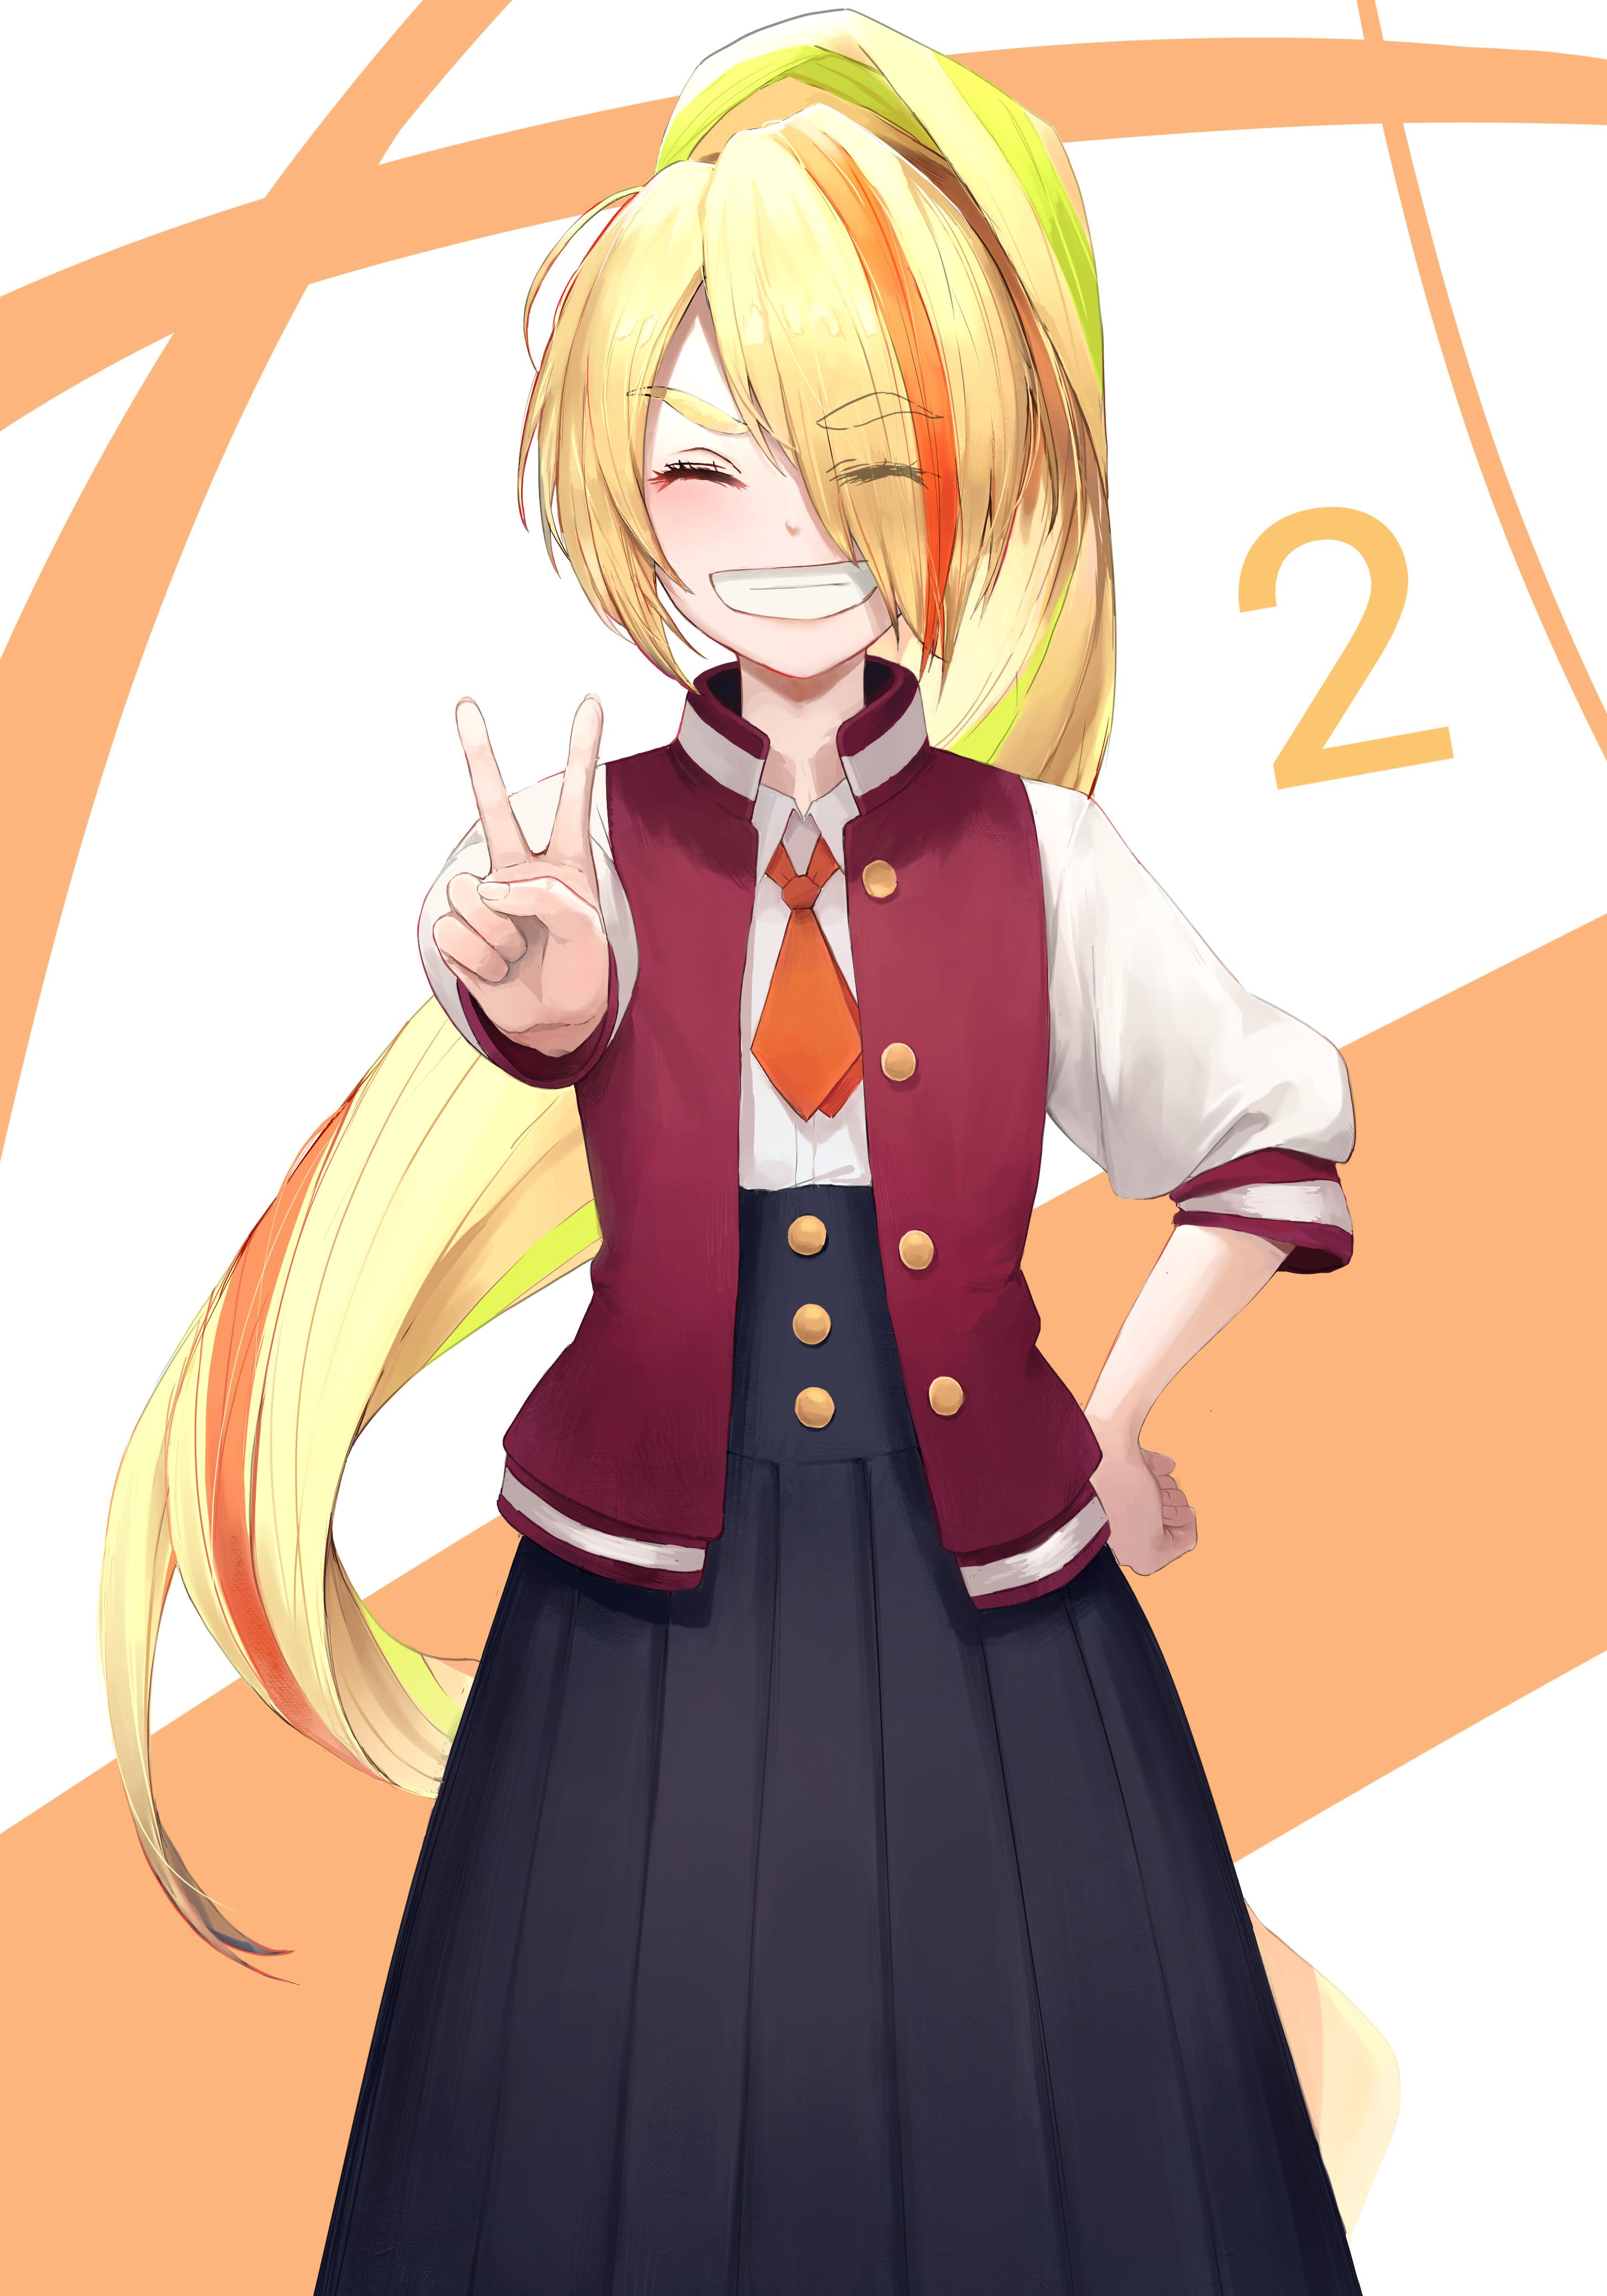 Zombieland Saga Standing School Uniform Long Hair Long Skirt Smile Anime Girls Looking At Viewer Pon 2908x4156